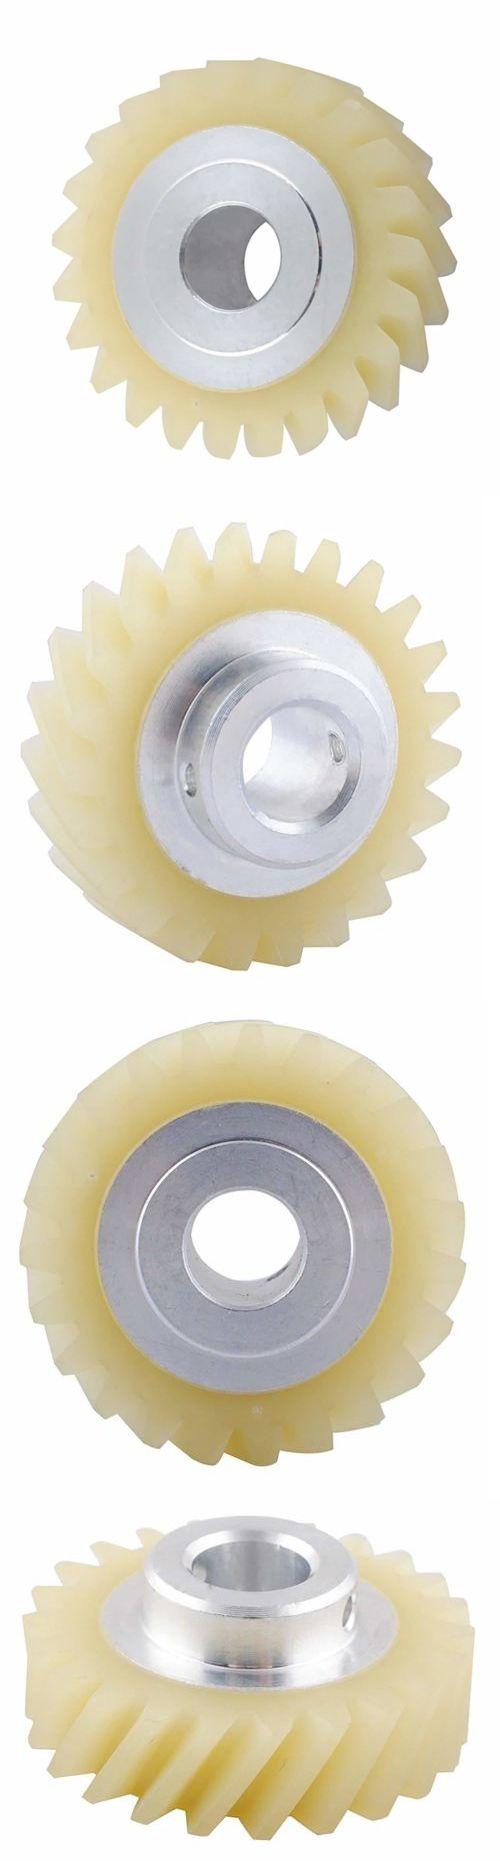 countertop mixers 133701 4162897 for kitchenaid mixer worm gear rh pinterest com